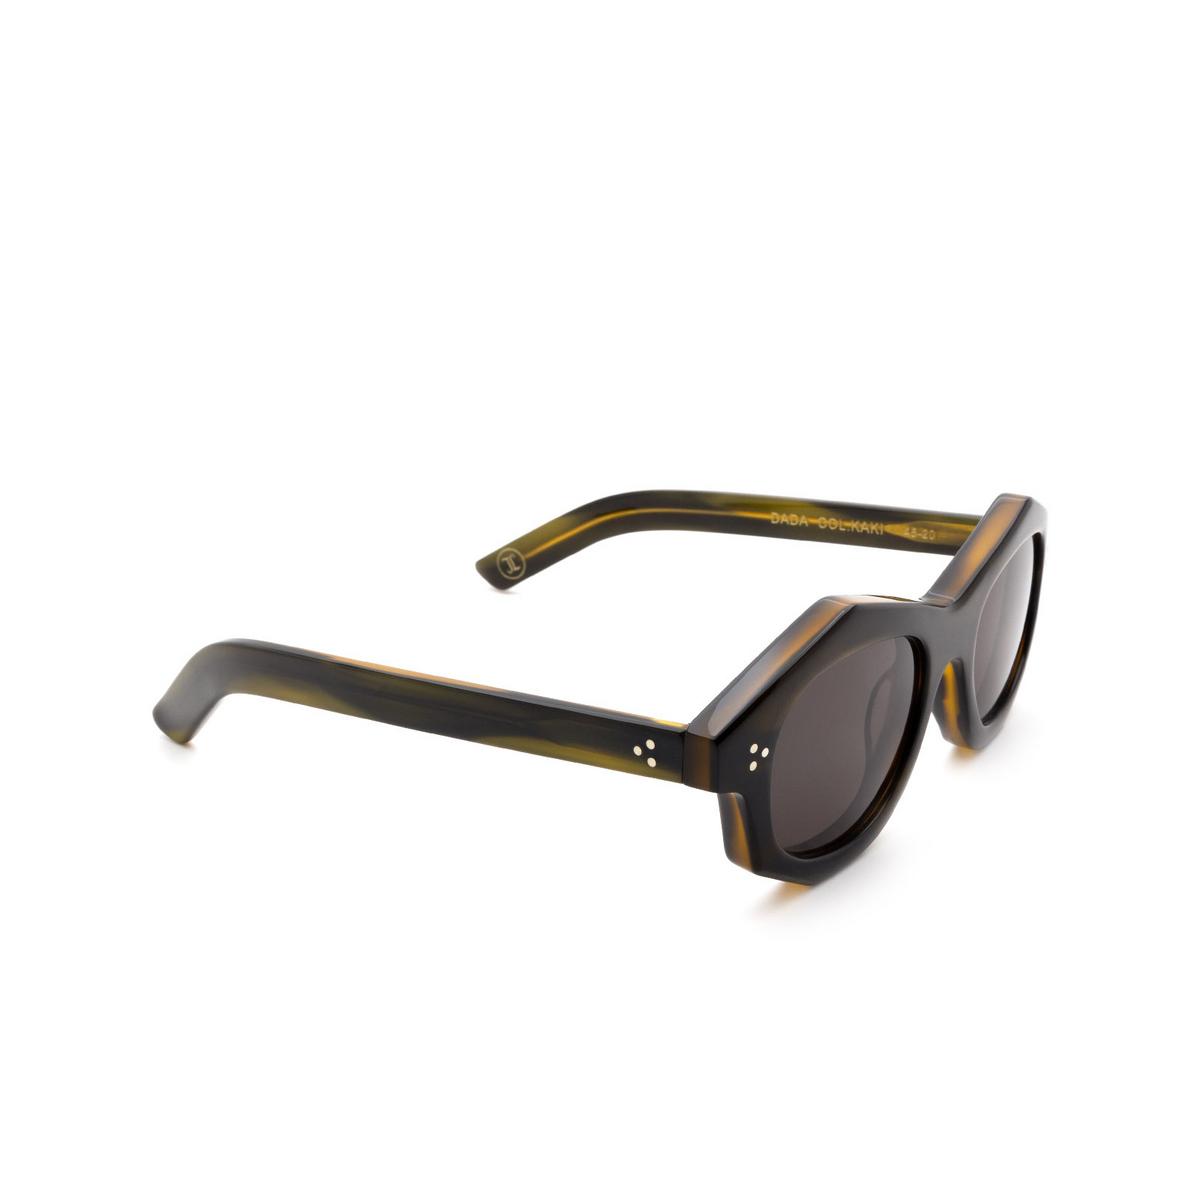 Lesca® Irregular Sunglasses: Dada Sun color Kaki - three-quarters view.